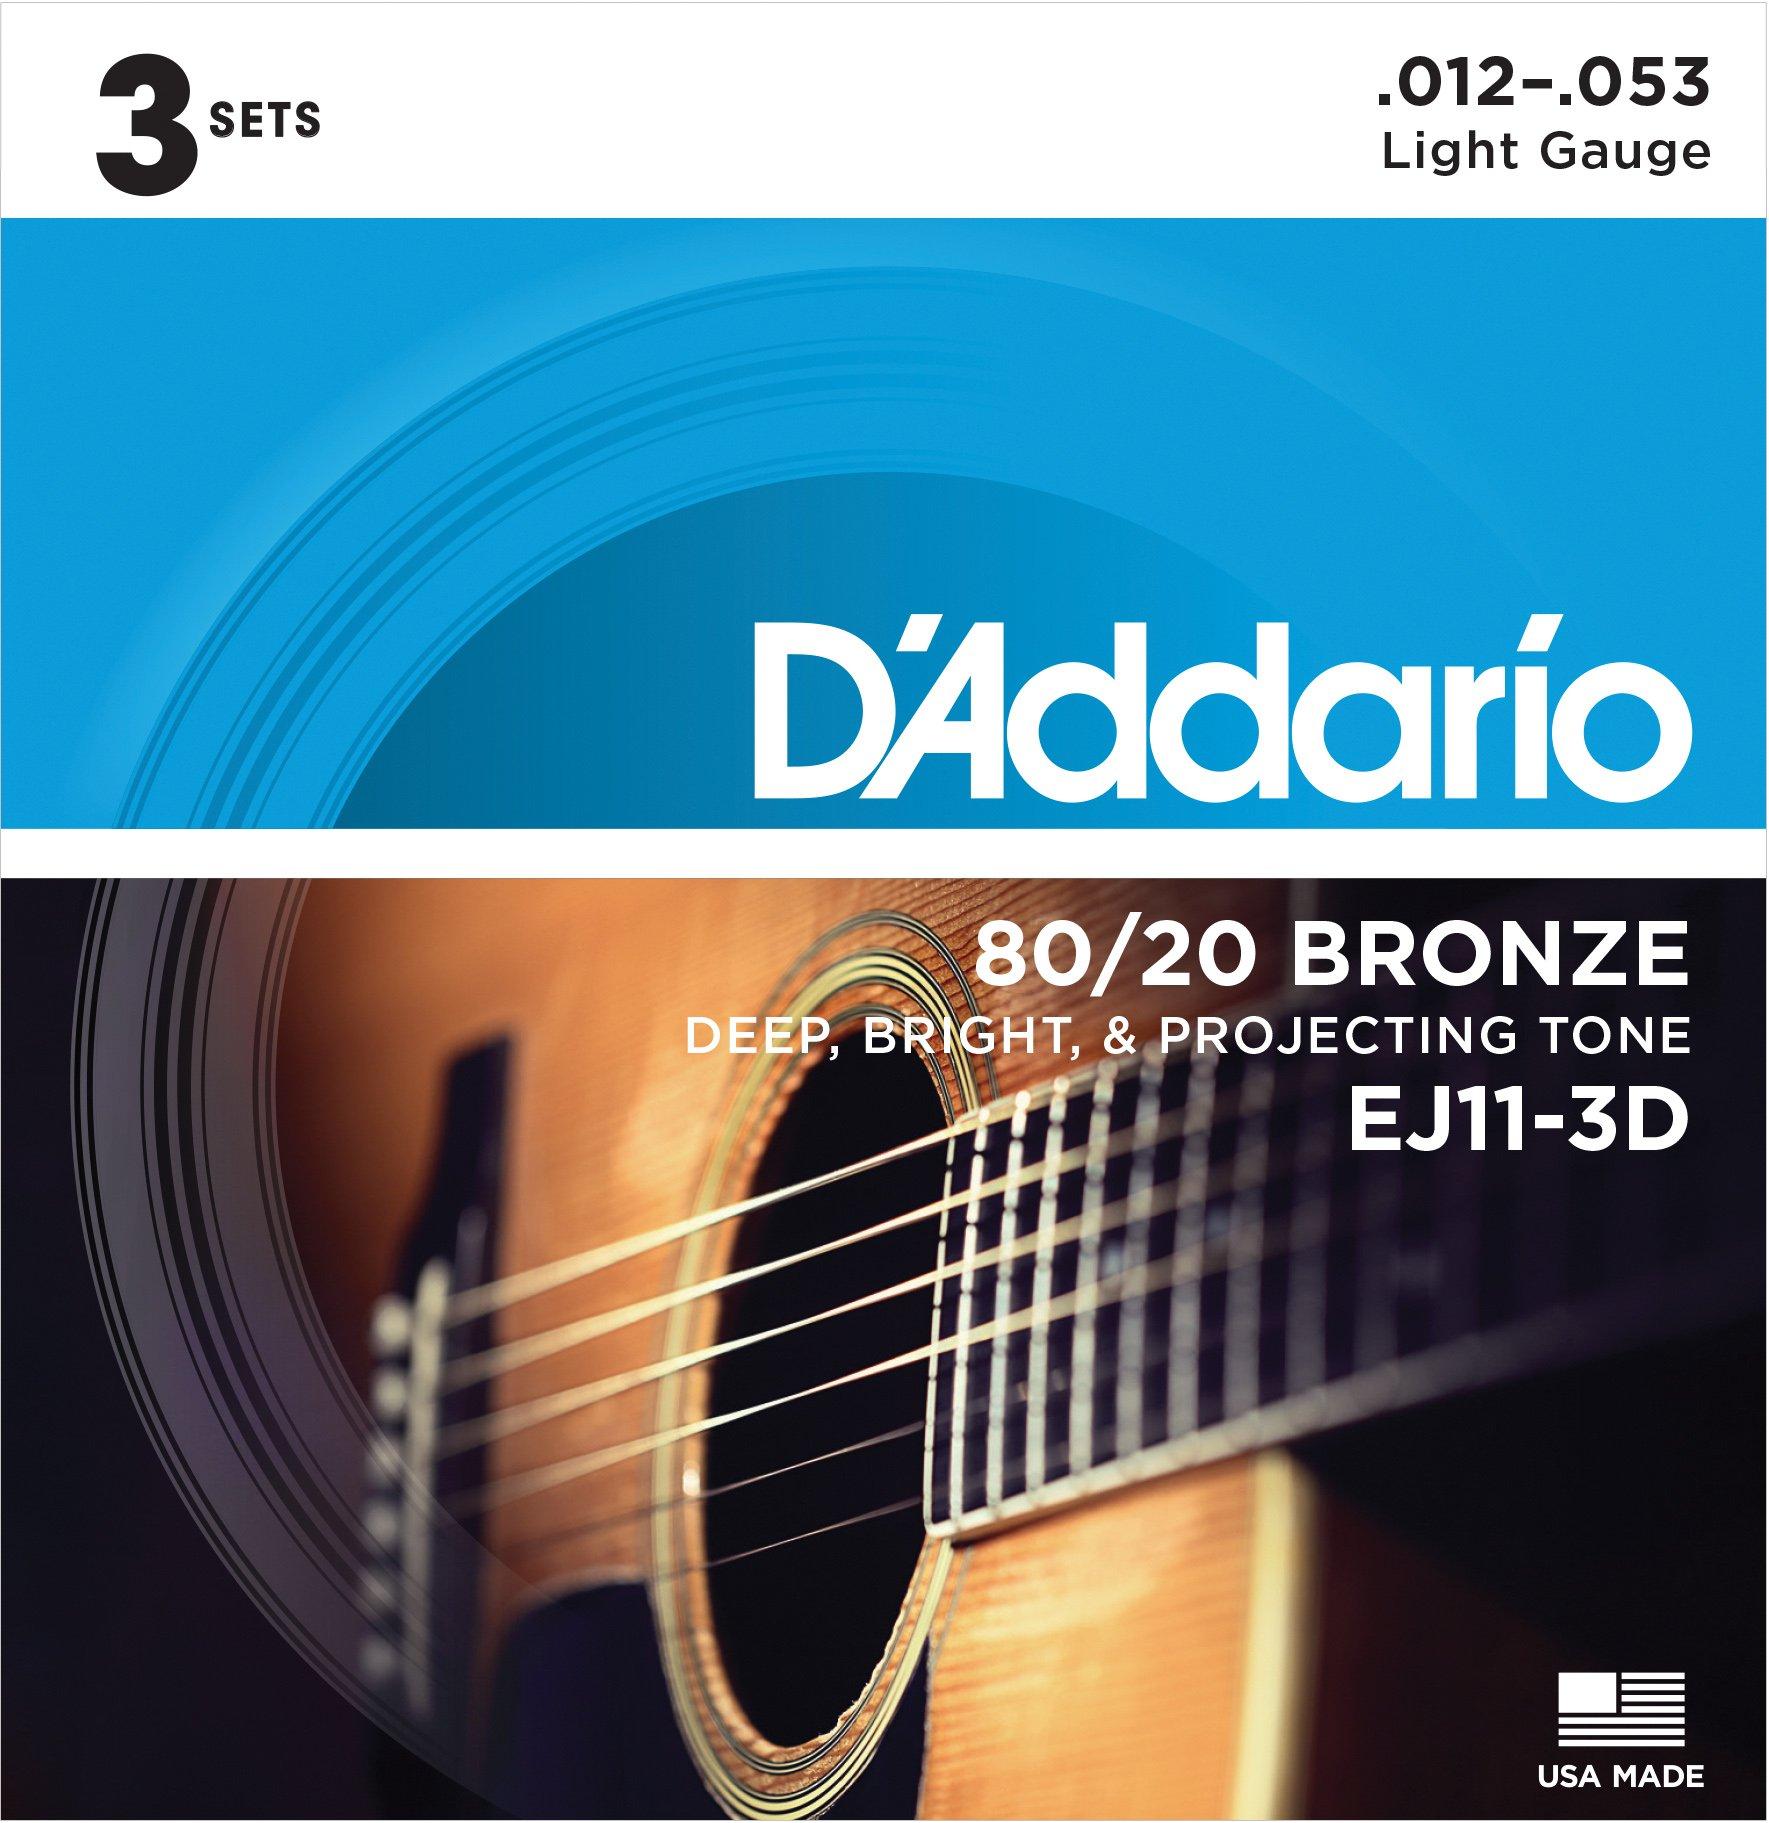 D'Addario EJ11-3D 80/20 Bronze Acoustic Guitar Strings, 12-53, 3 Sets, Light